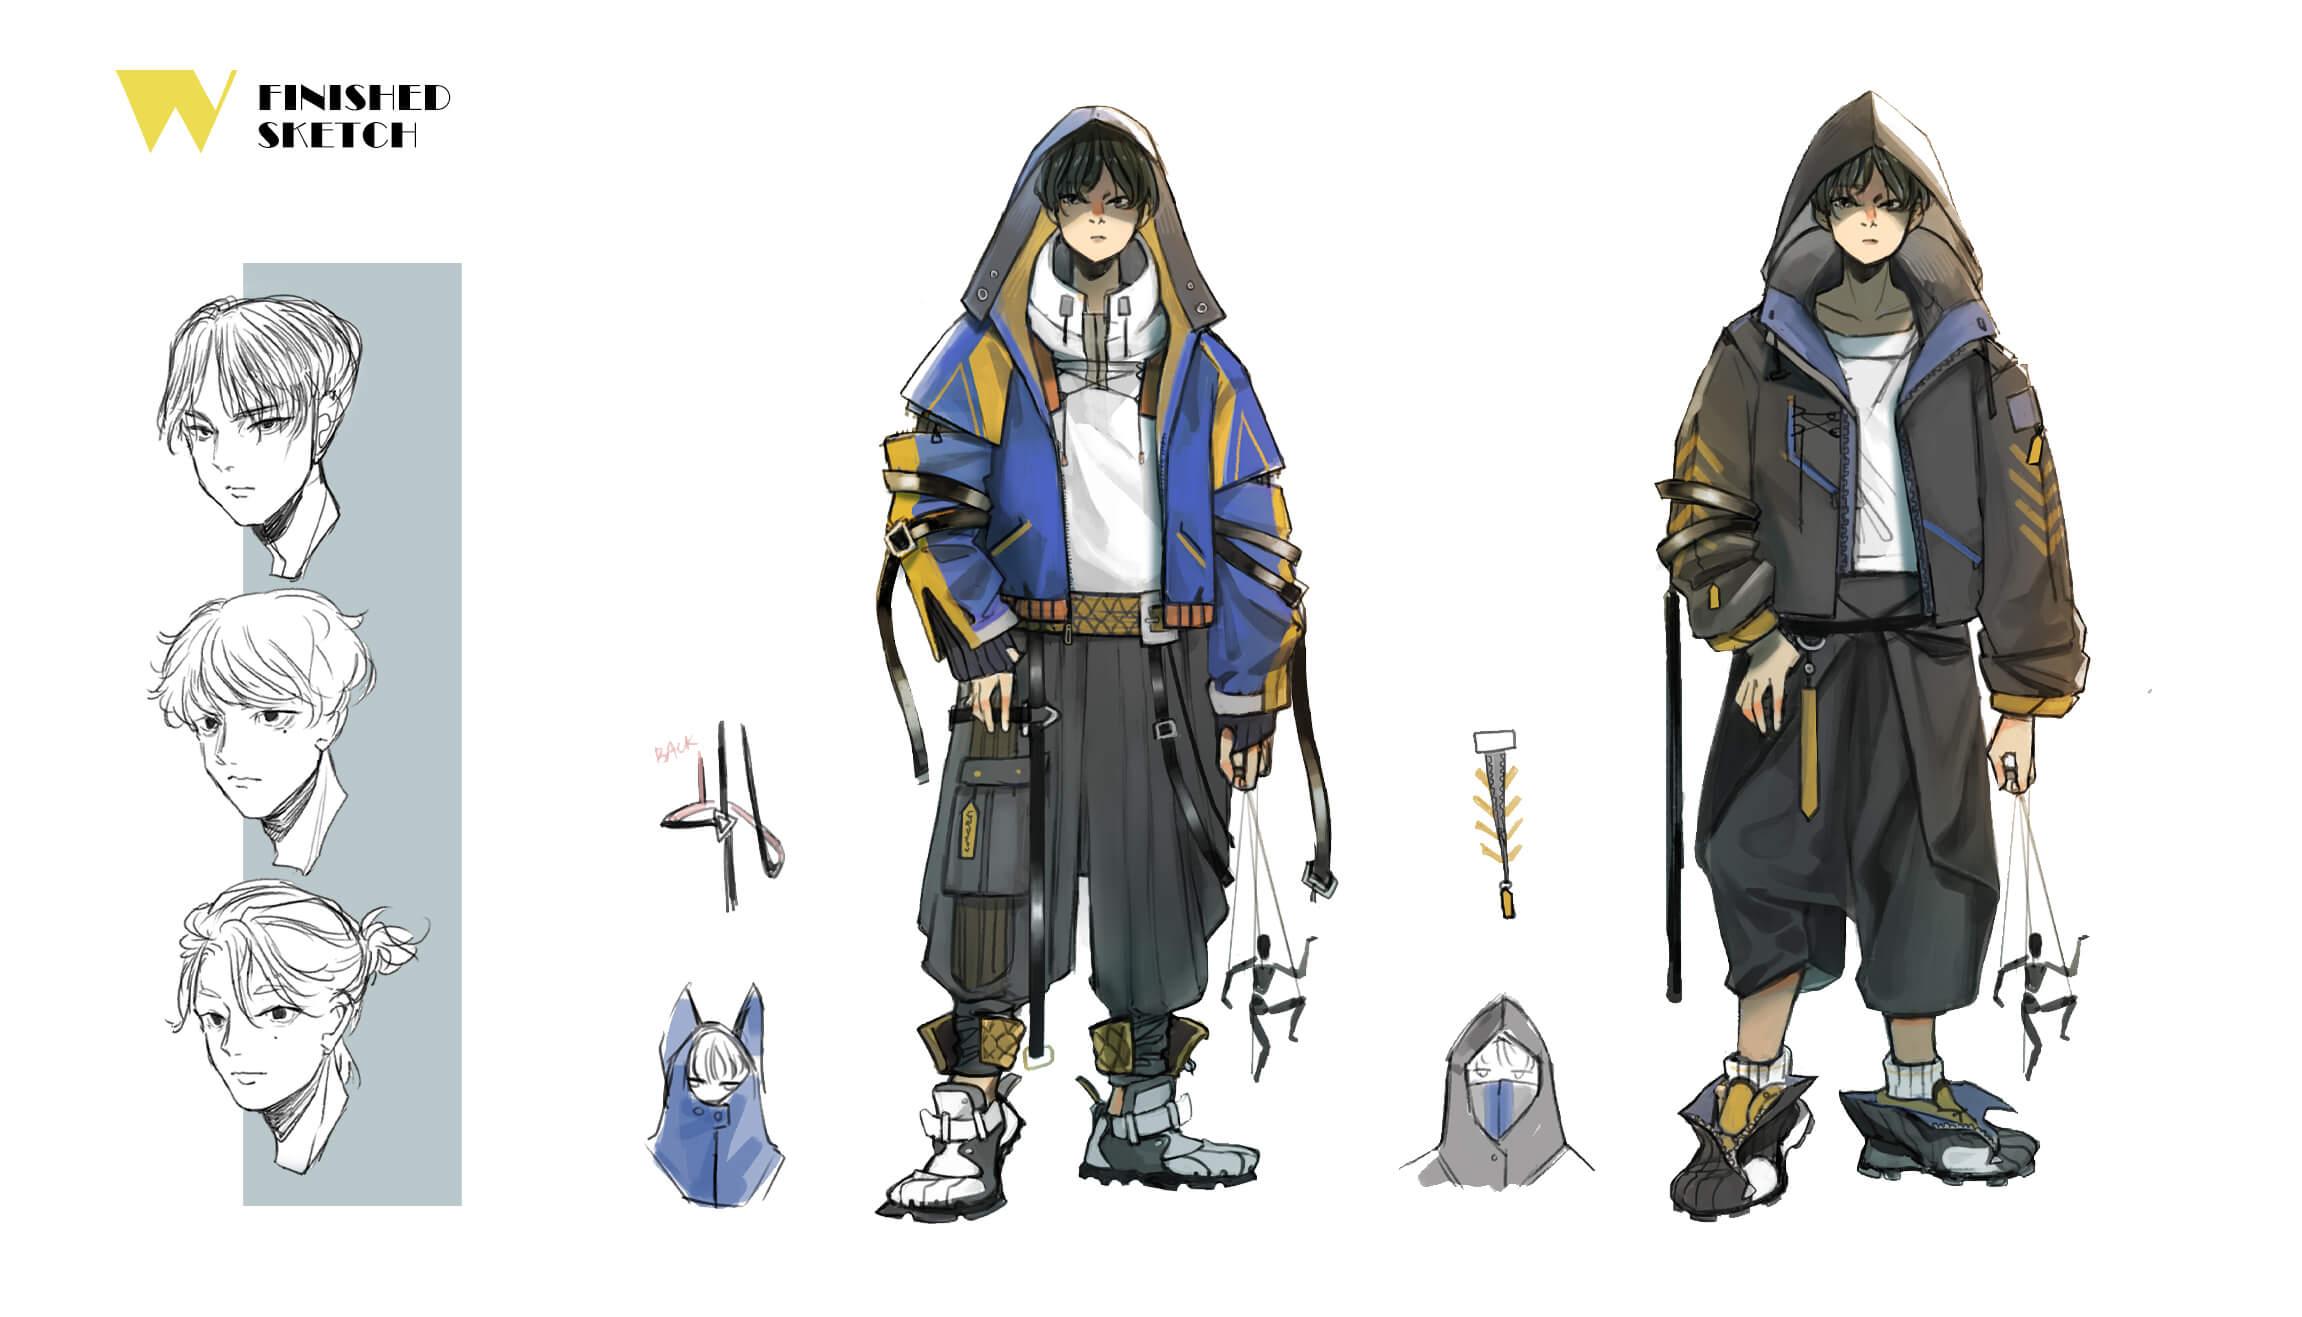 FOX_character-design-2